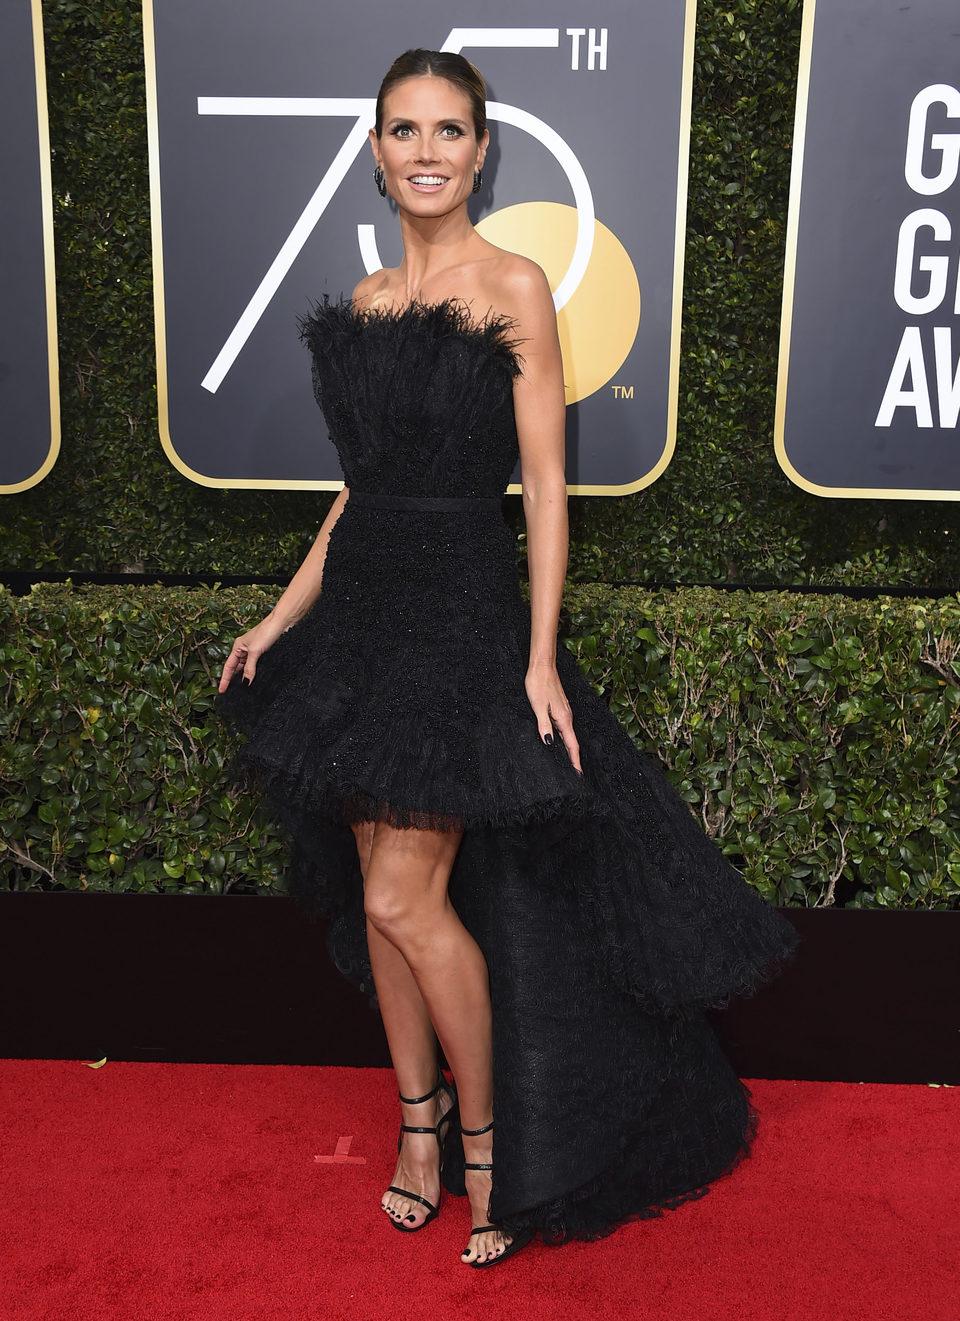 Heidi Klum at the Golden Globe's red carpet 2018